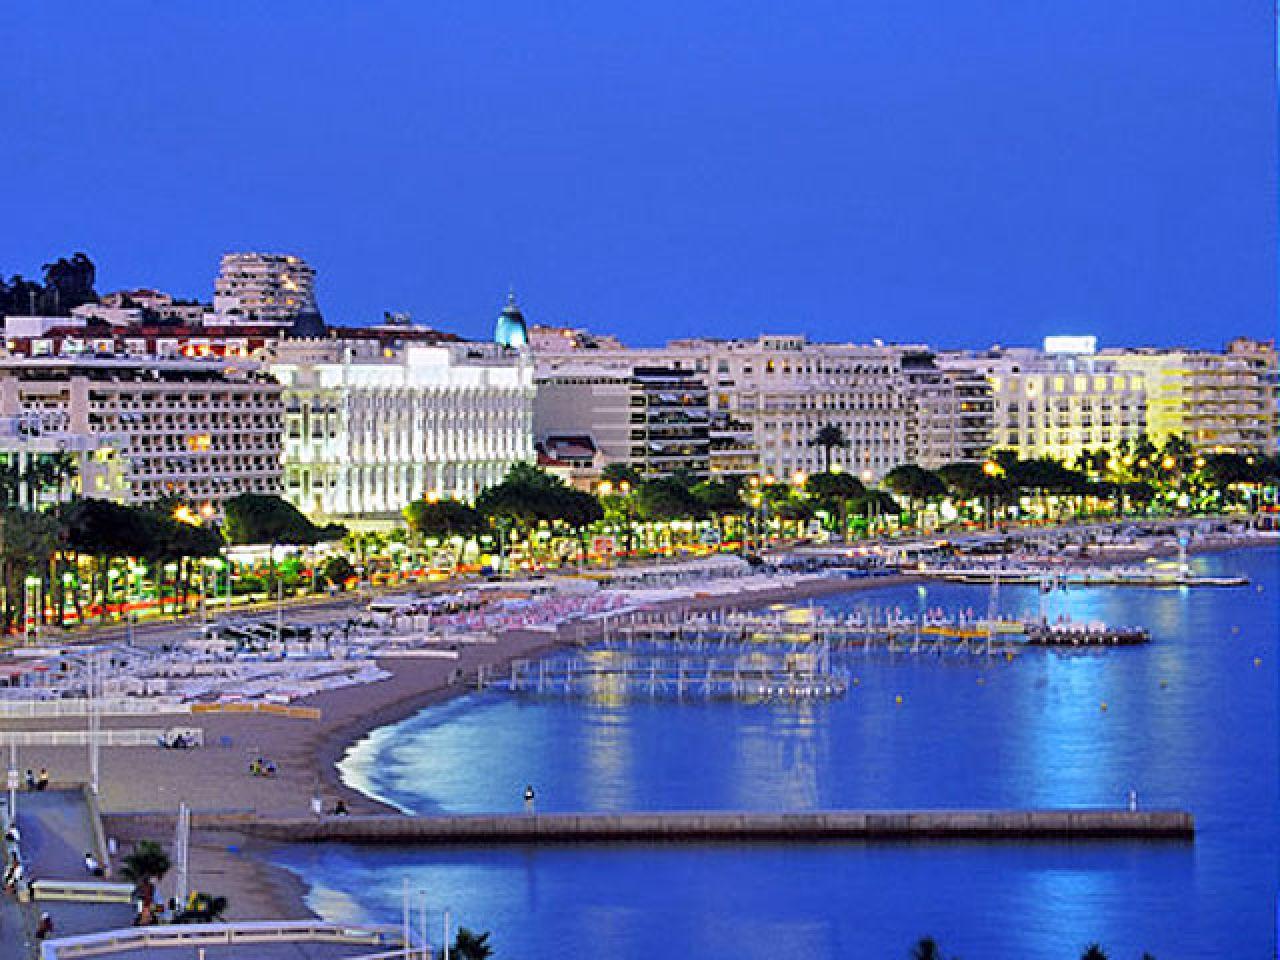 Noleggio Barche Cannes - Navalia | Noleggia un Sogno